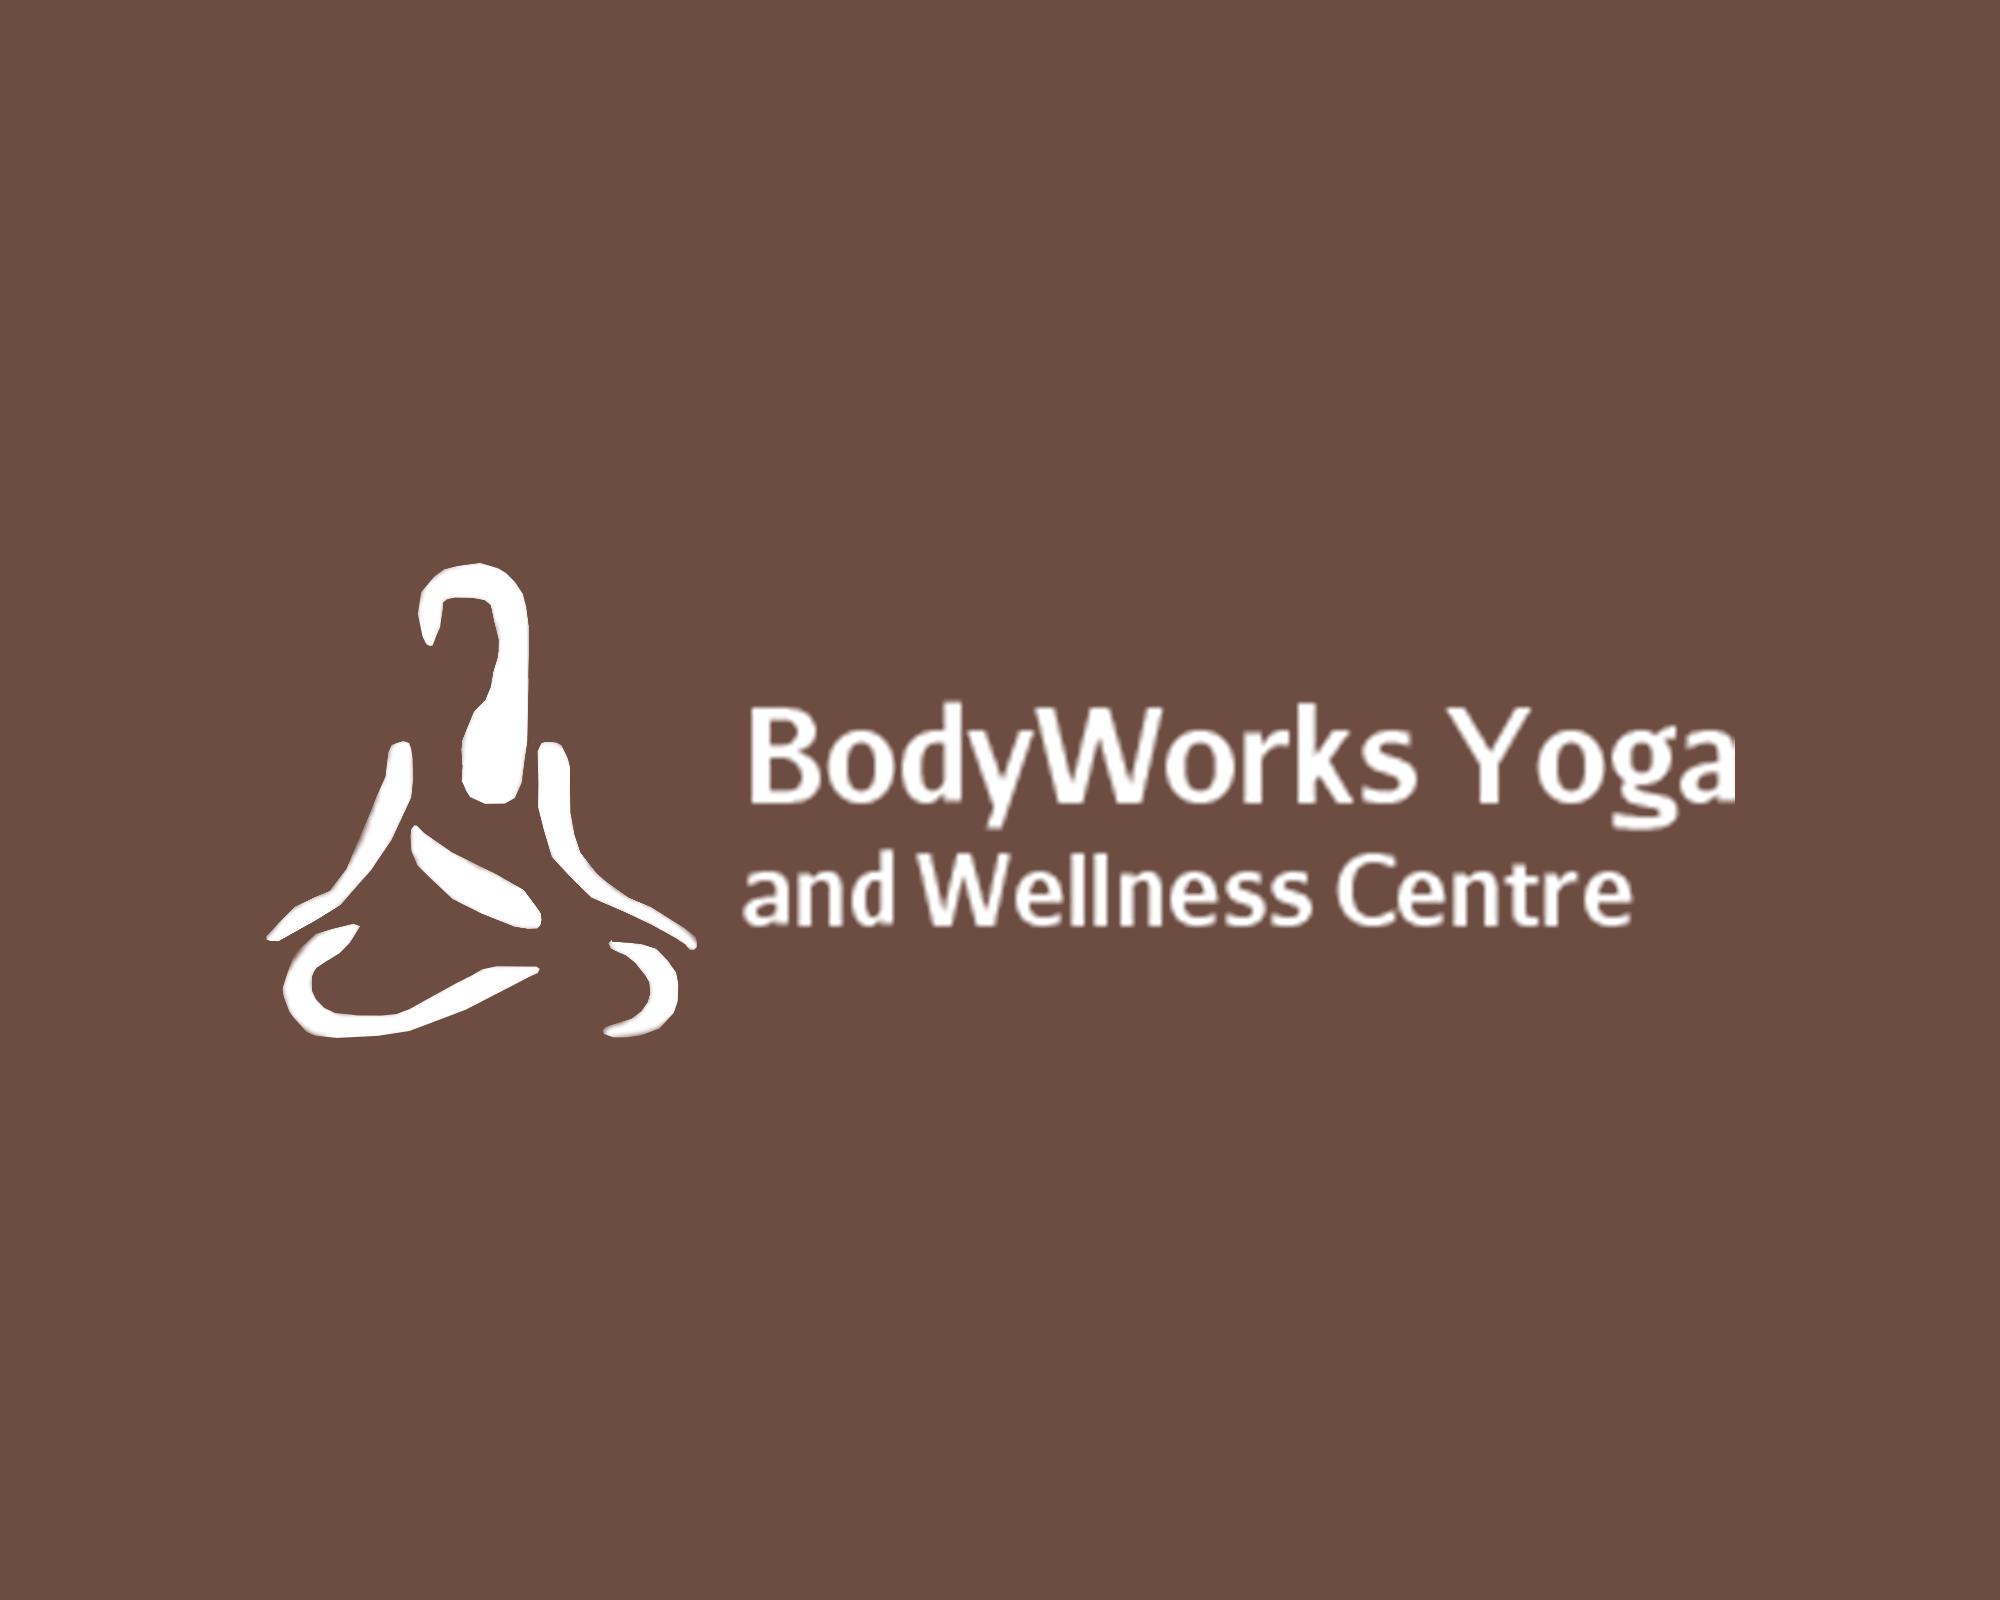 body works yoga and wellnes centre Logo